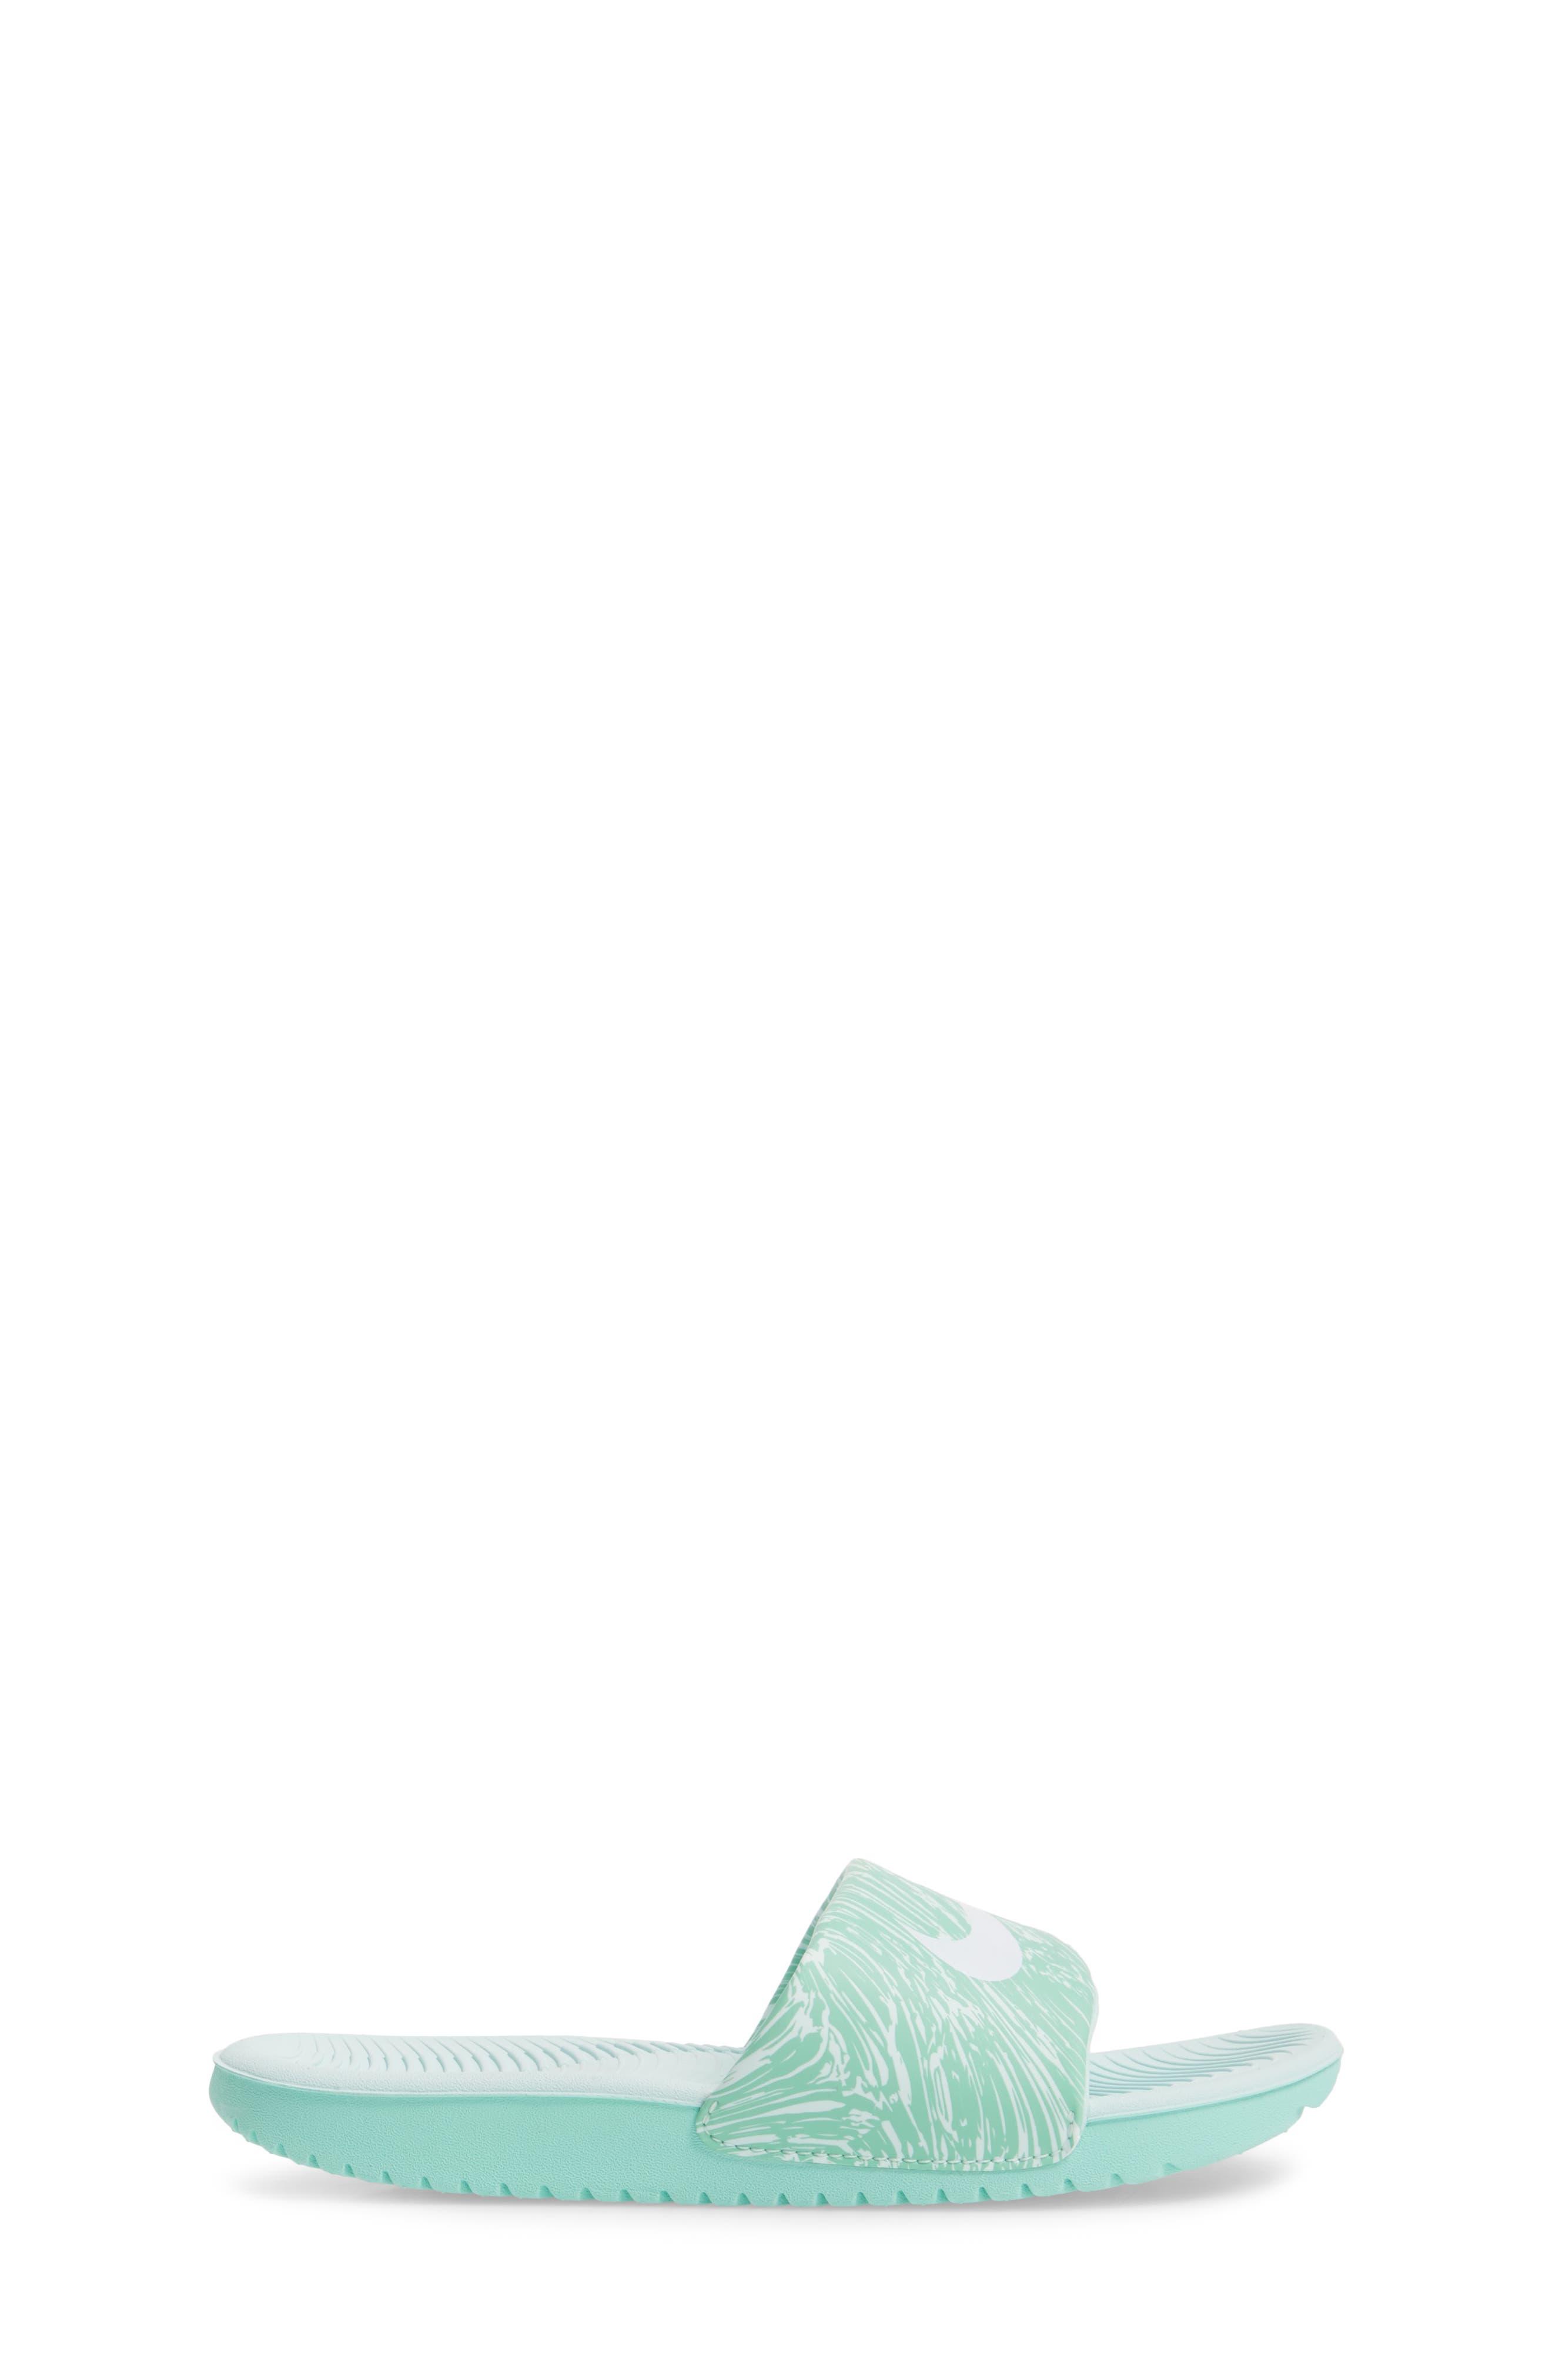 'Kawa' Print Slide Sandal,                             Alternate thumbnail 3, color,                             Emerald Rise/ White/ Igloo